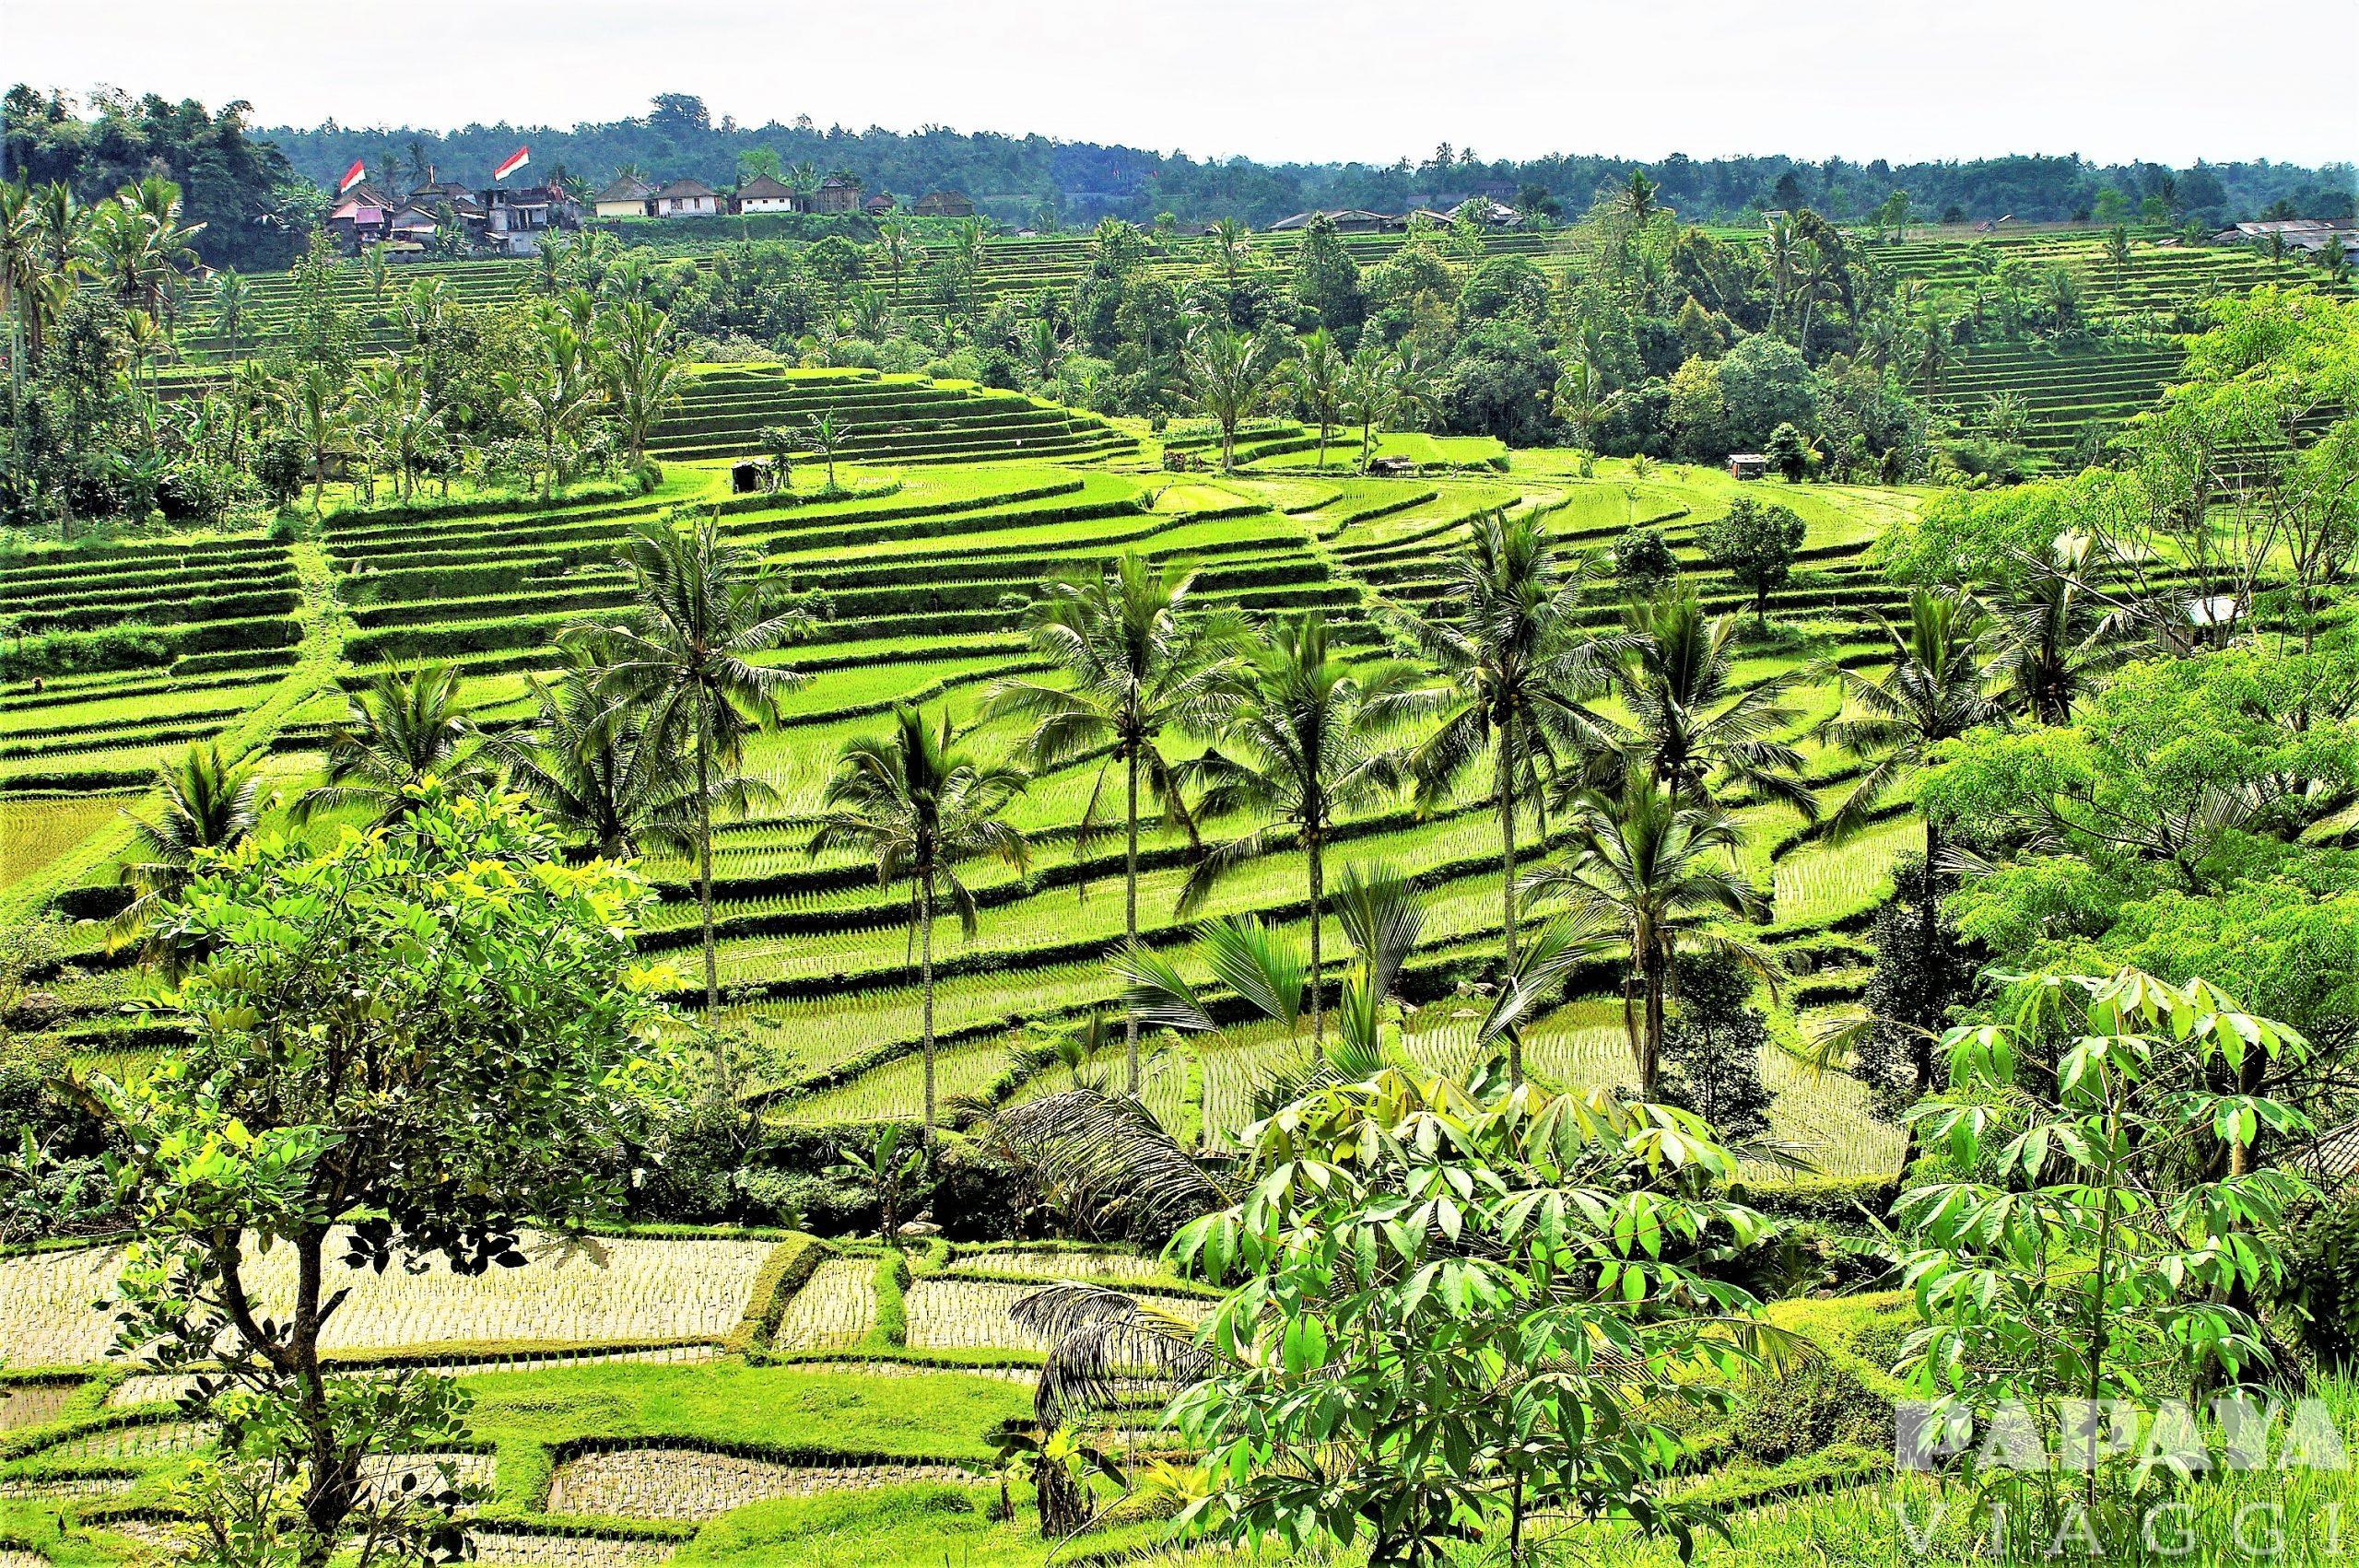 Indonesia, fra vulcani e spiagge